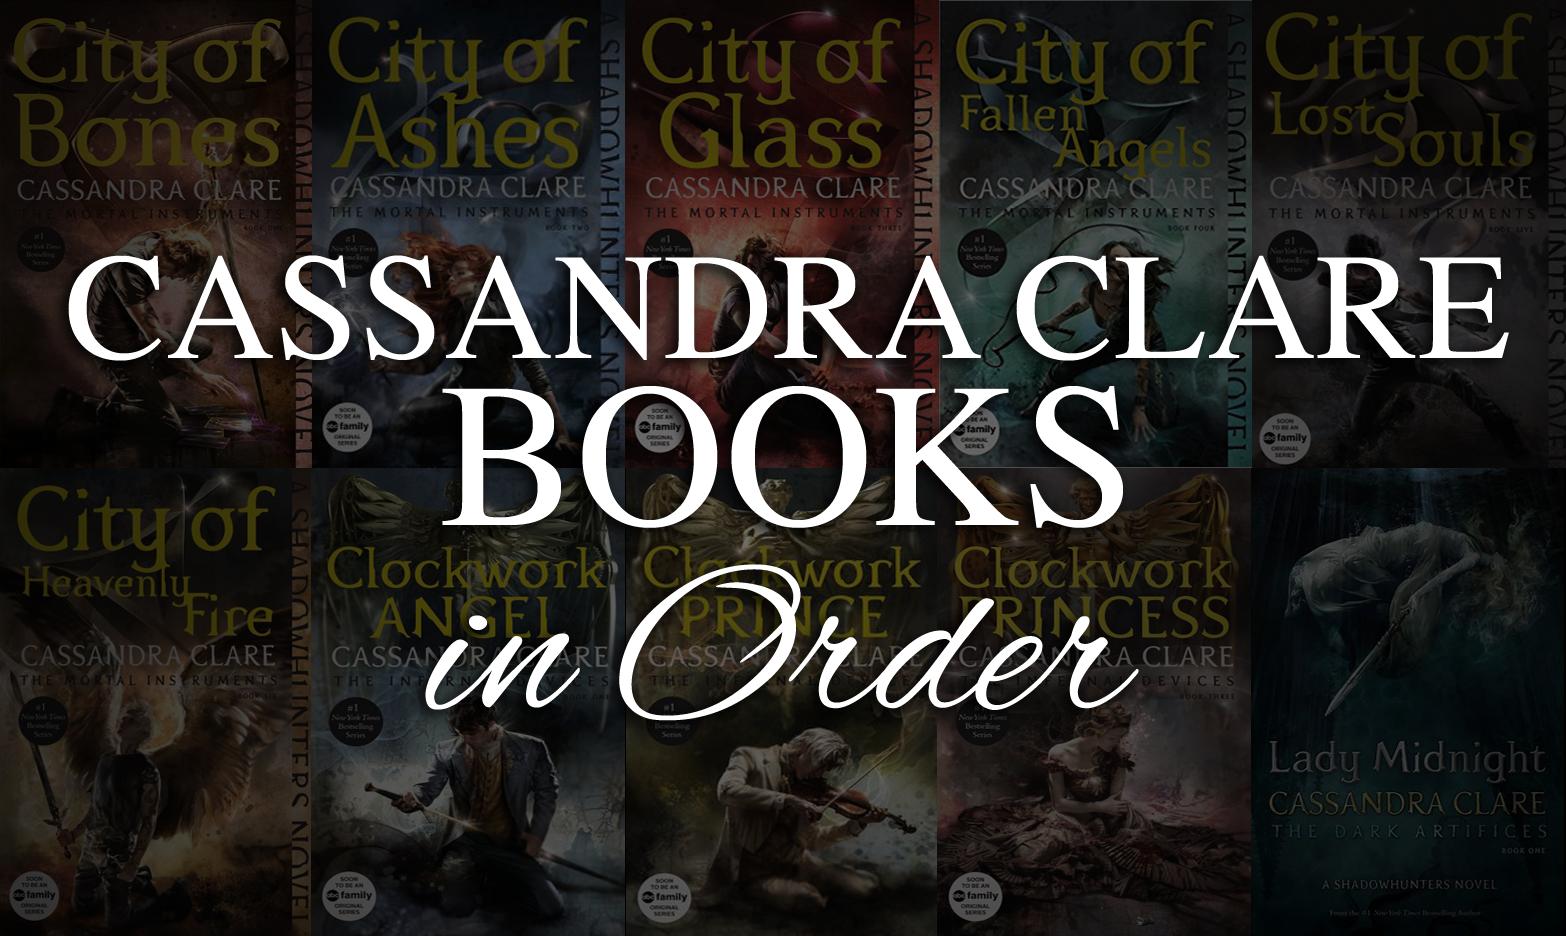 clare cassandra books order read ways